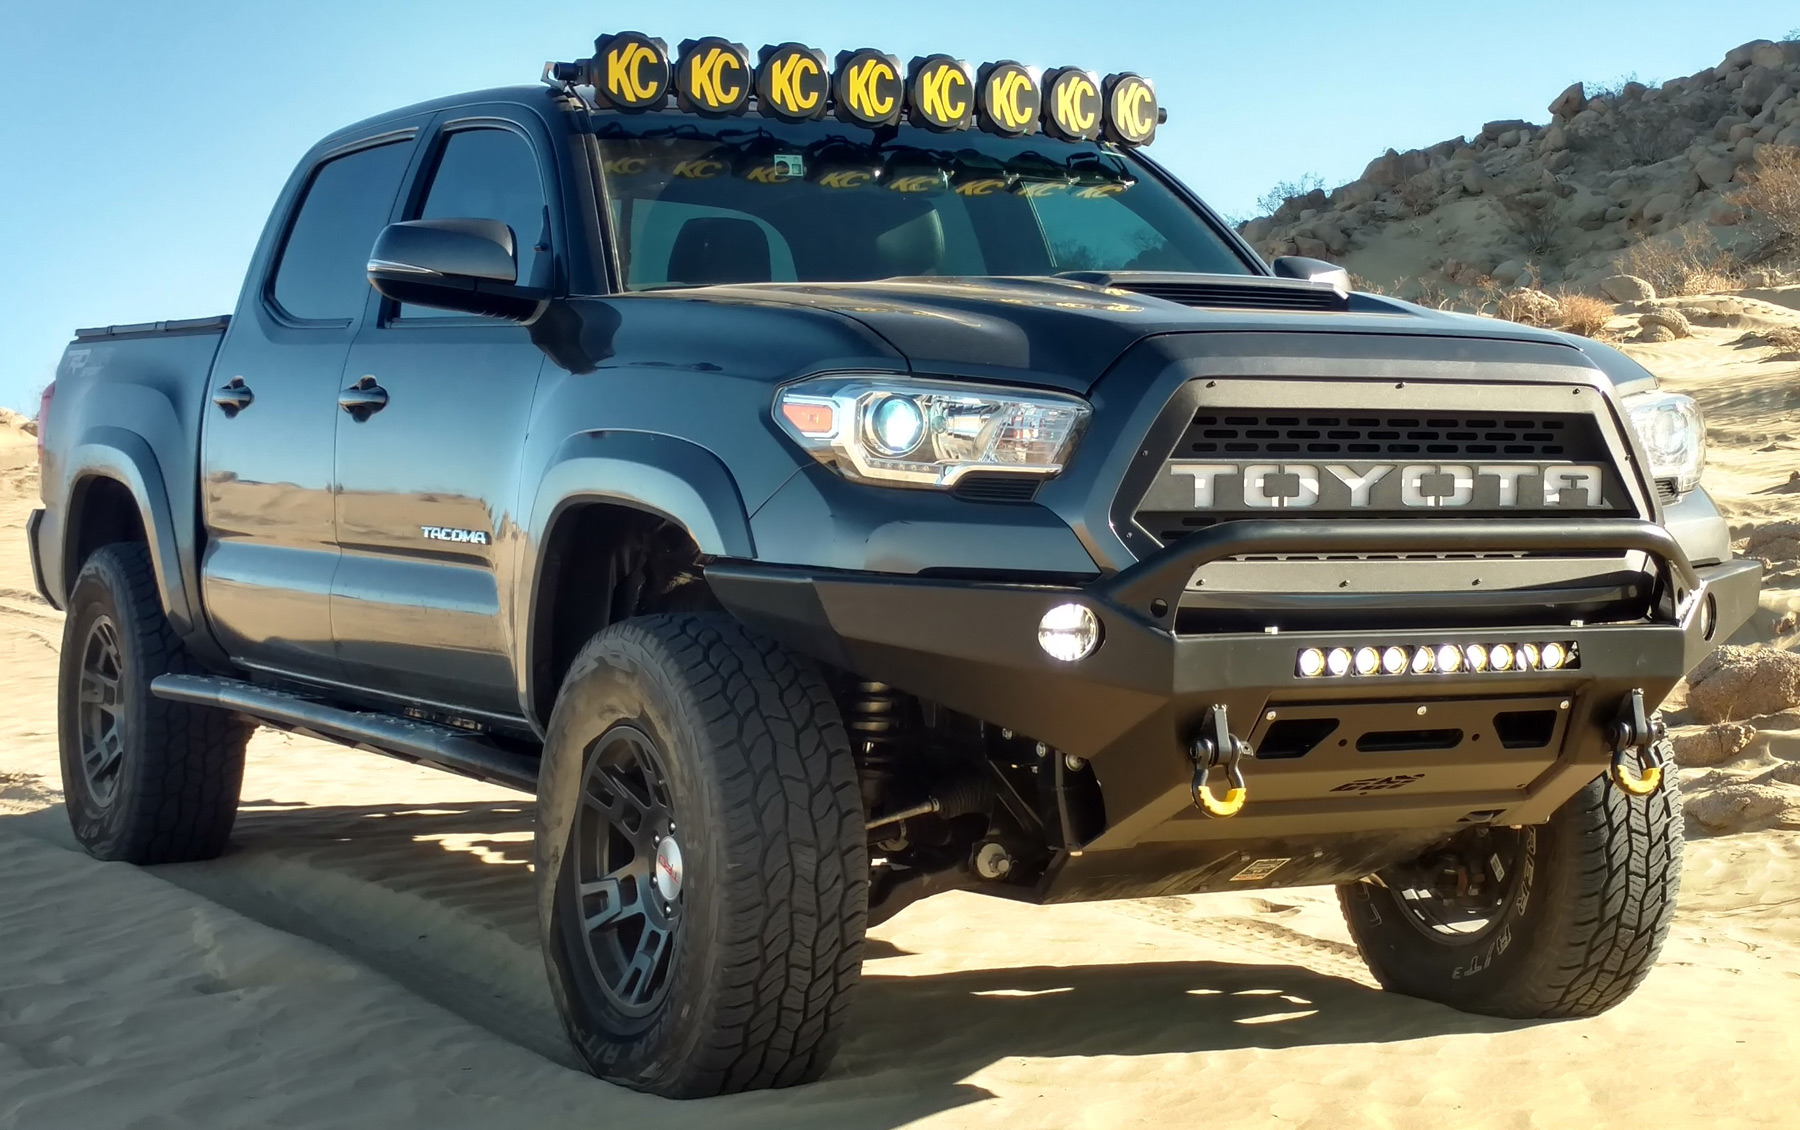 Custom Off Road Desert Stormer Toyota Tacoma - Image #05